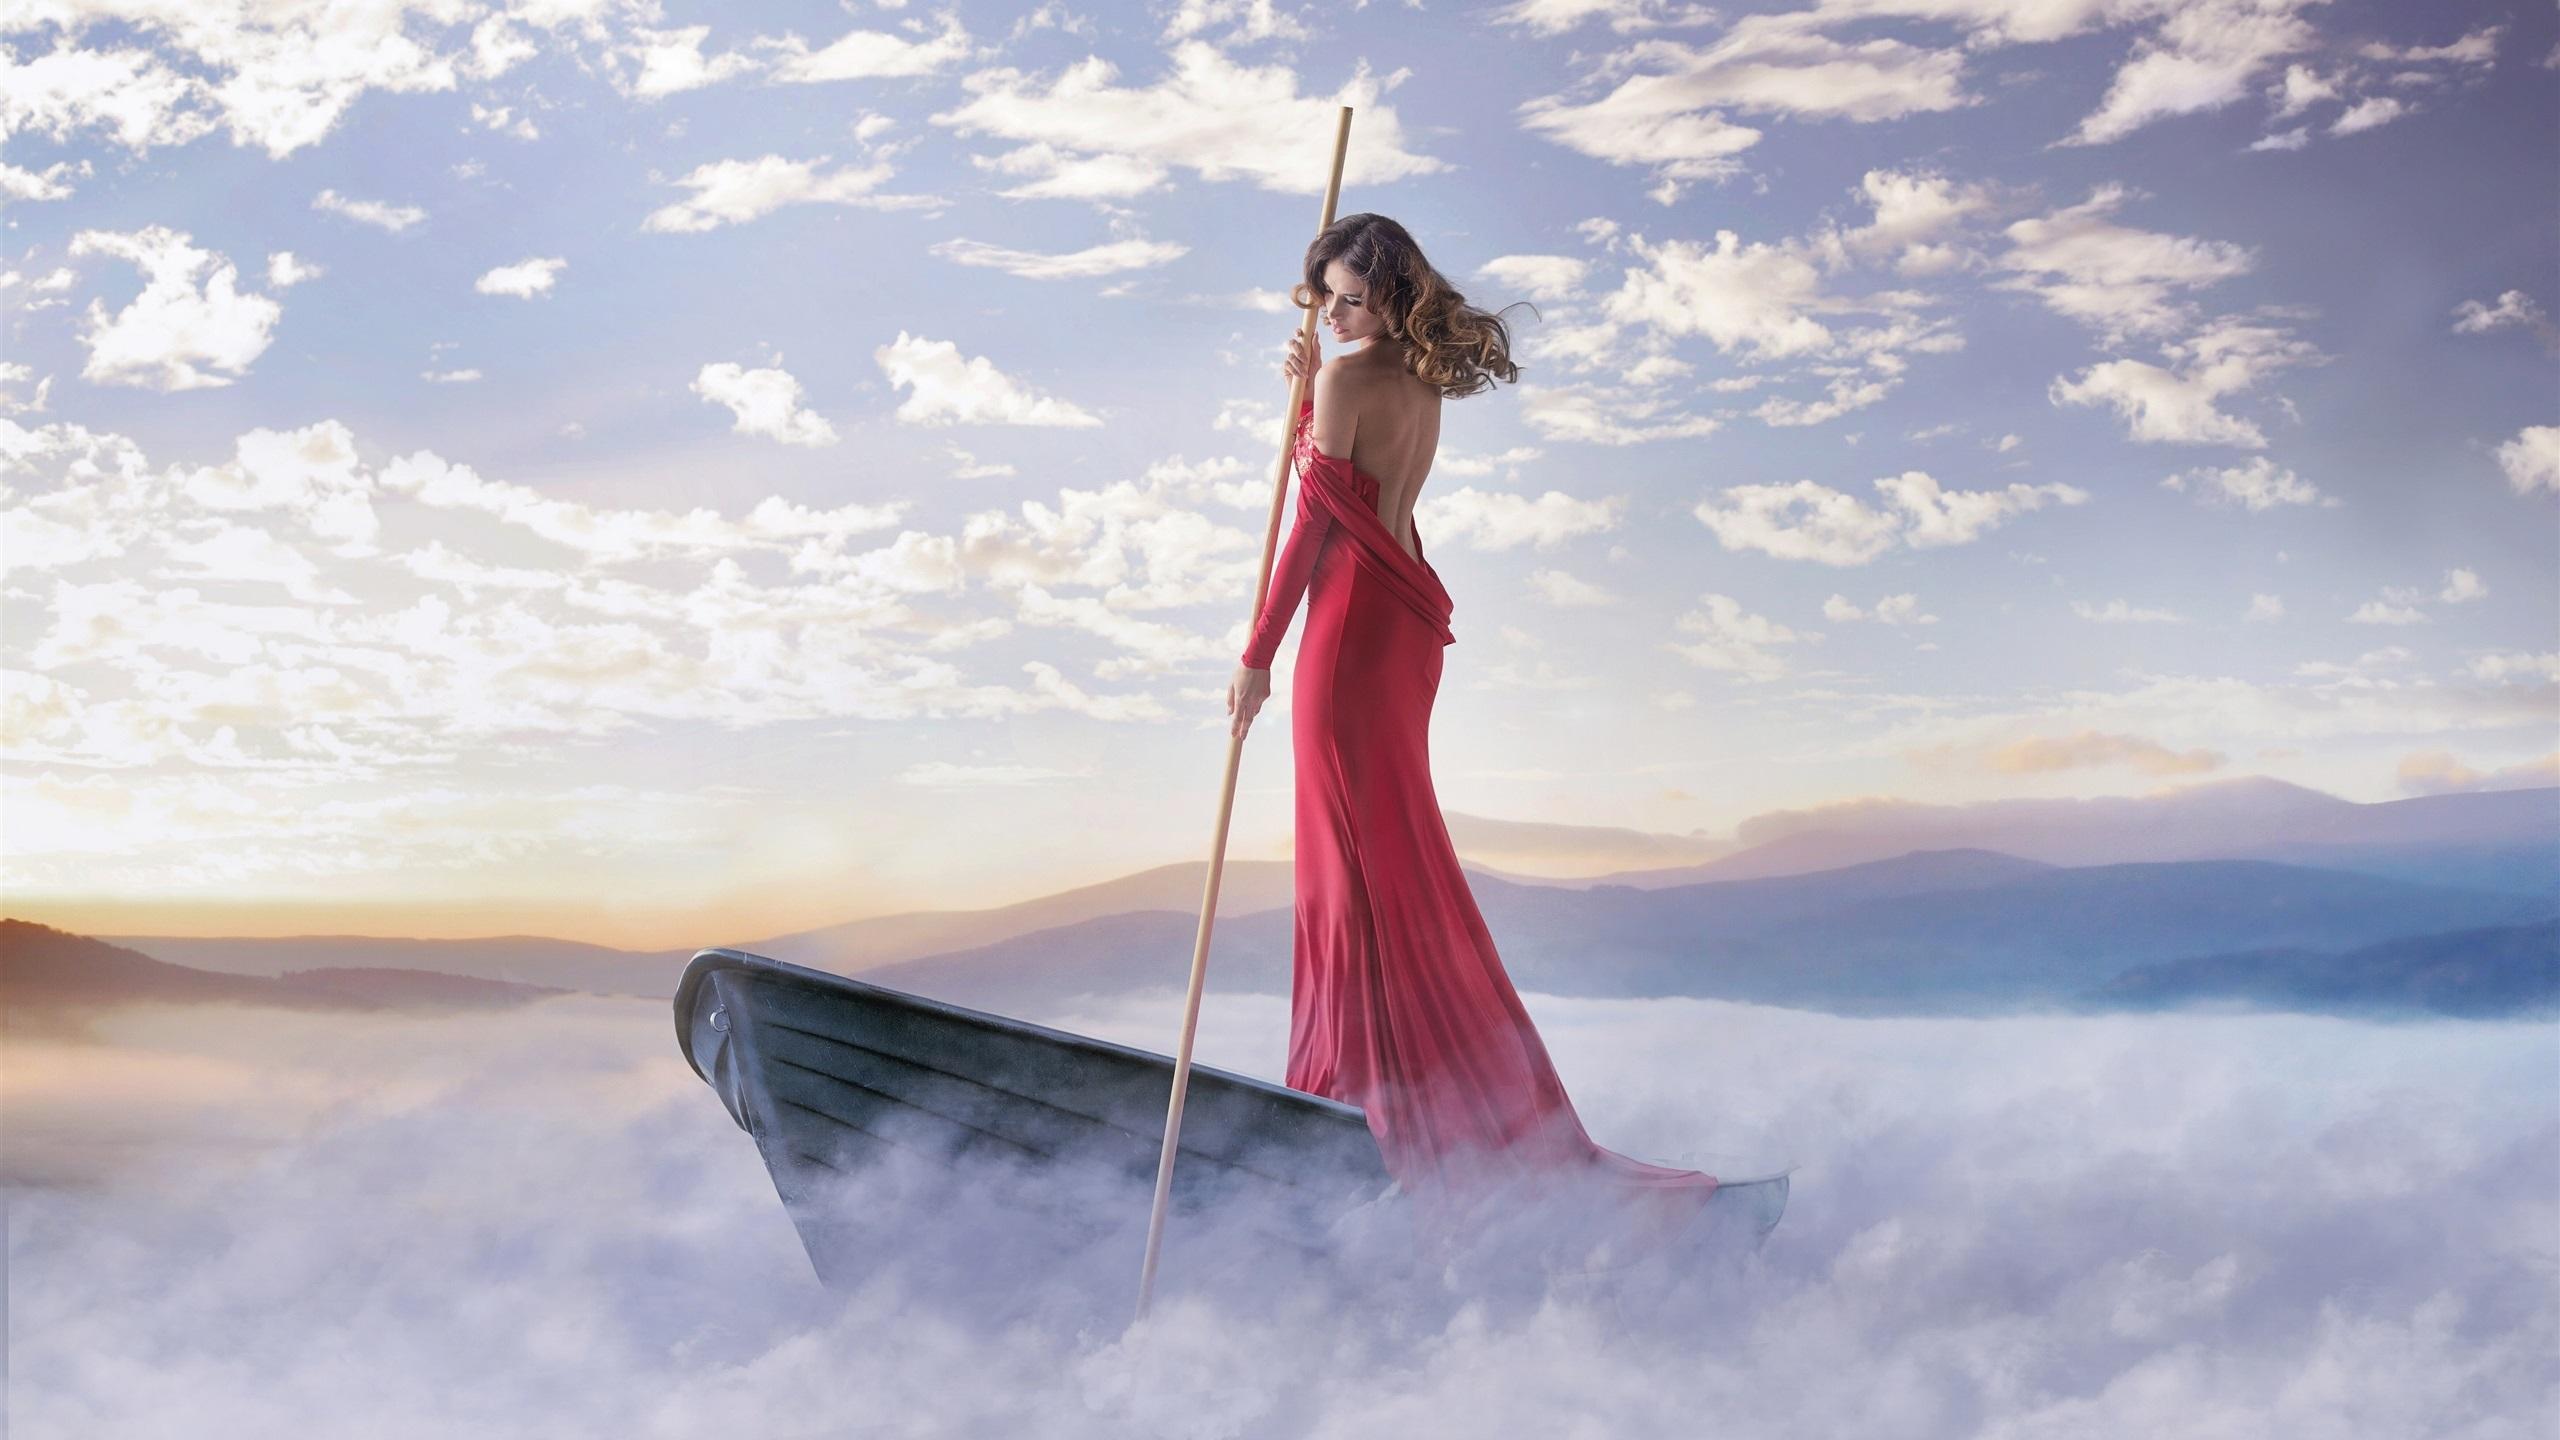 Fantasy Girl Hd Wallpaper Download Red Dress Girl Boat Fog Clouds Coast Wallpaper Girls